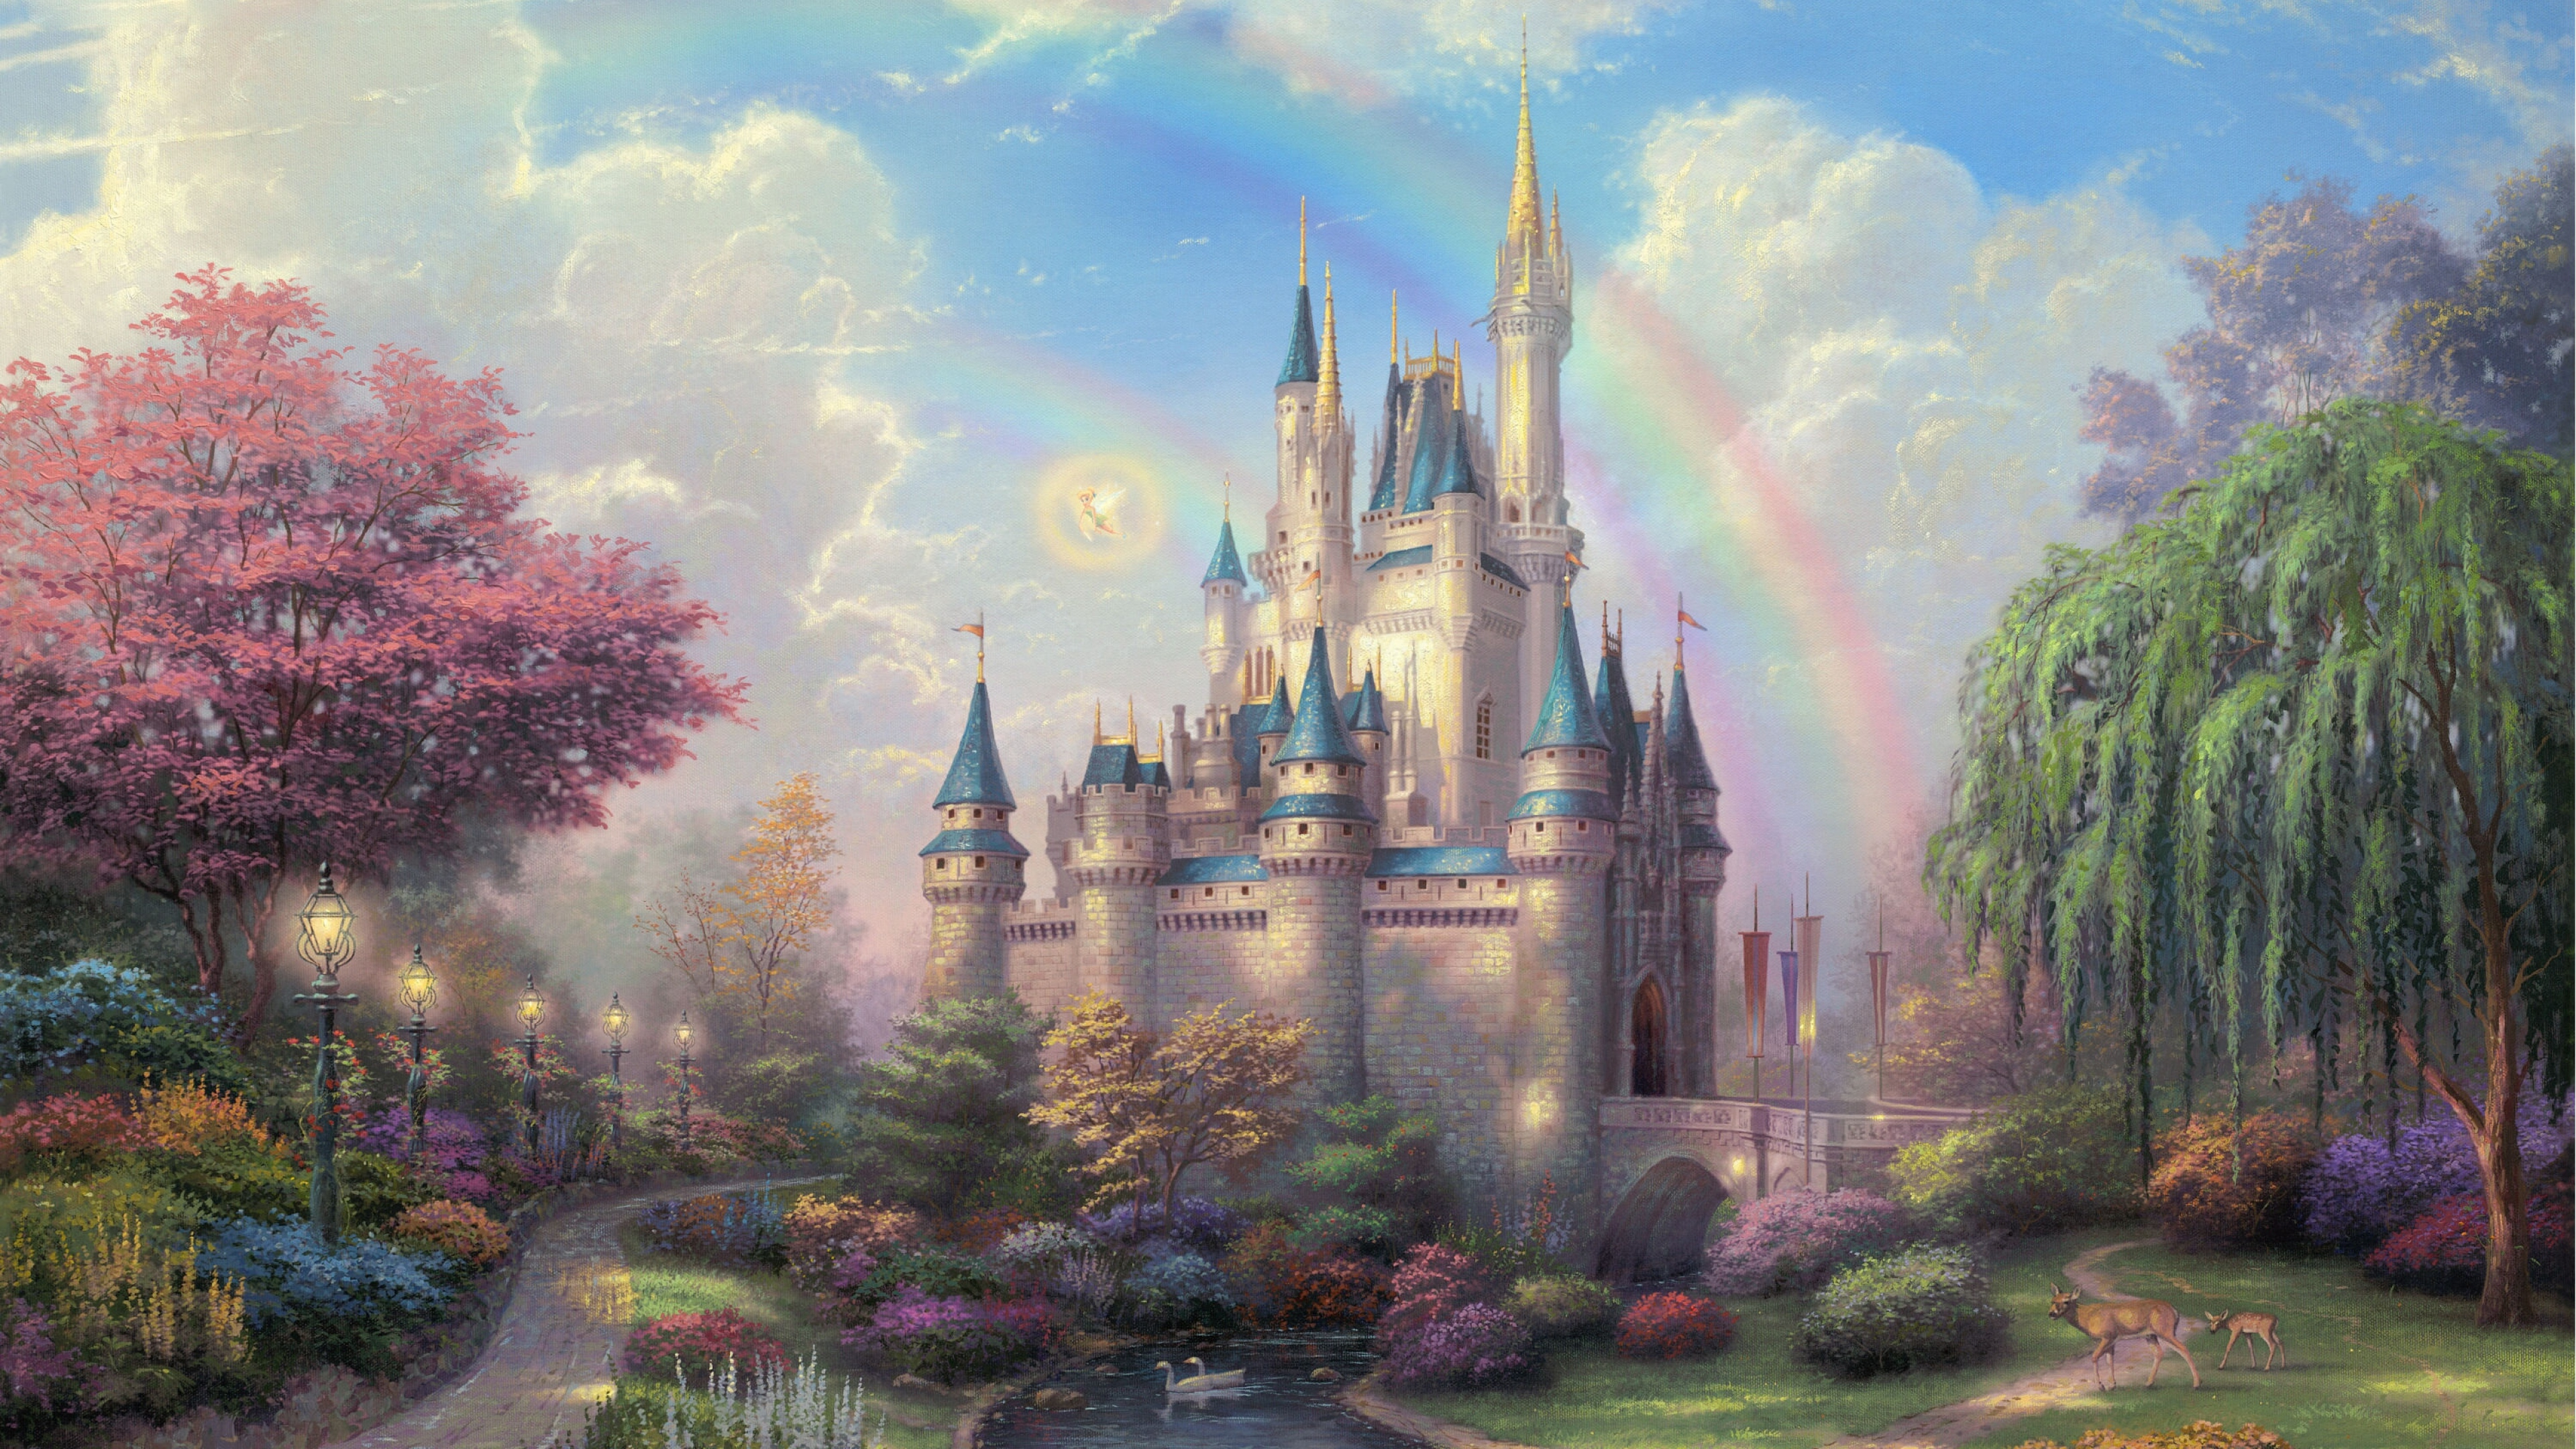 Disneyland Park Art 1280x1024 Resolution